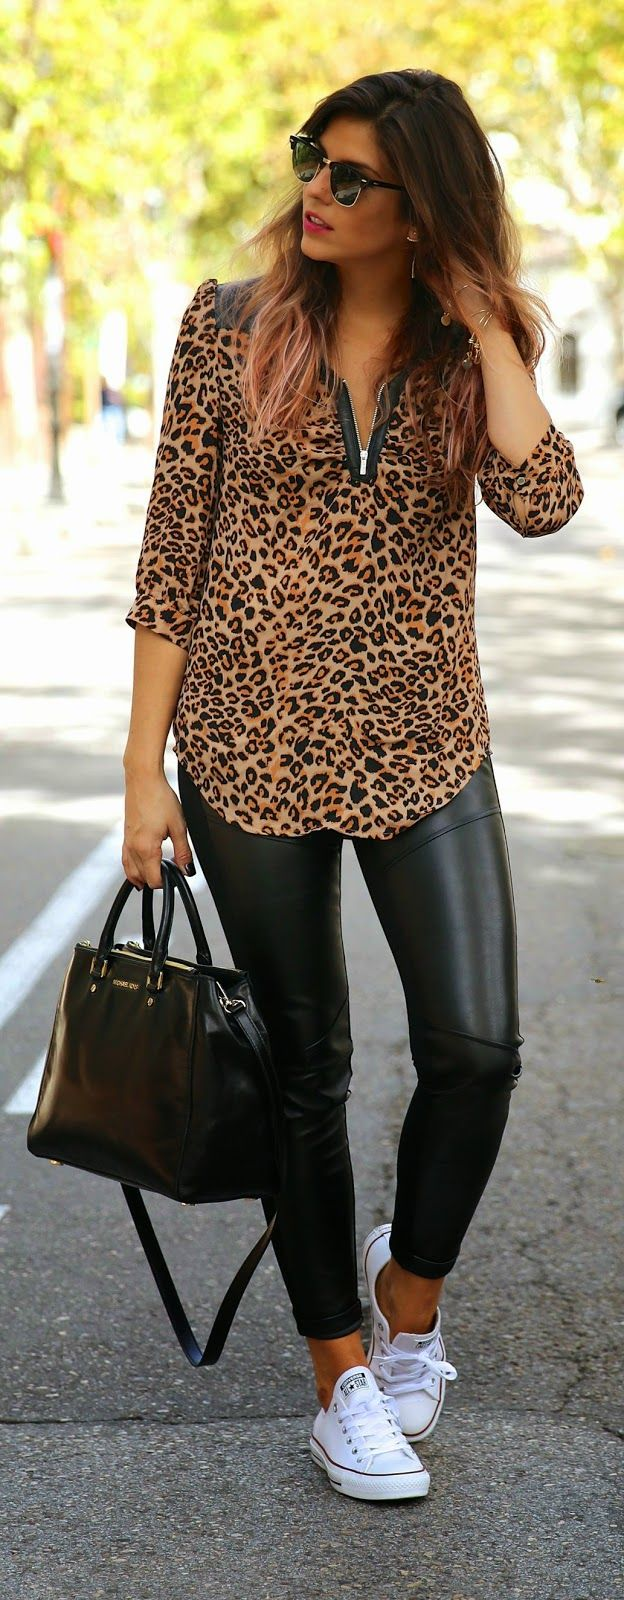 Leopard Top and Black Leggings